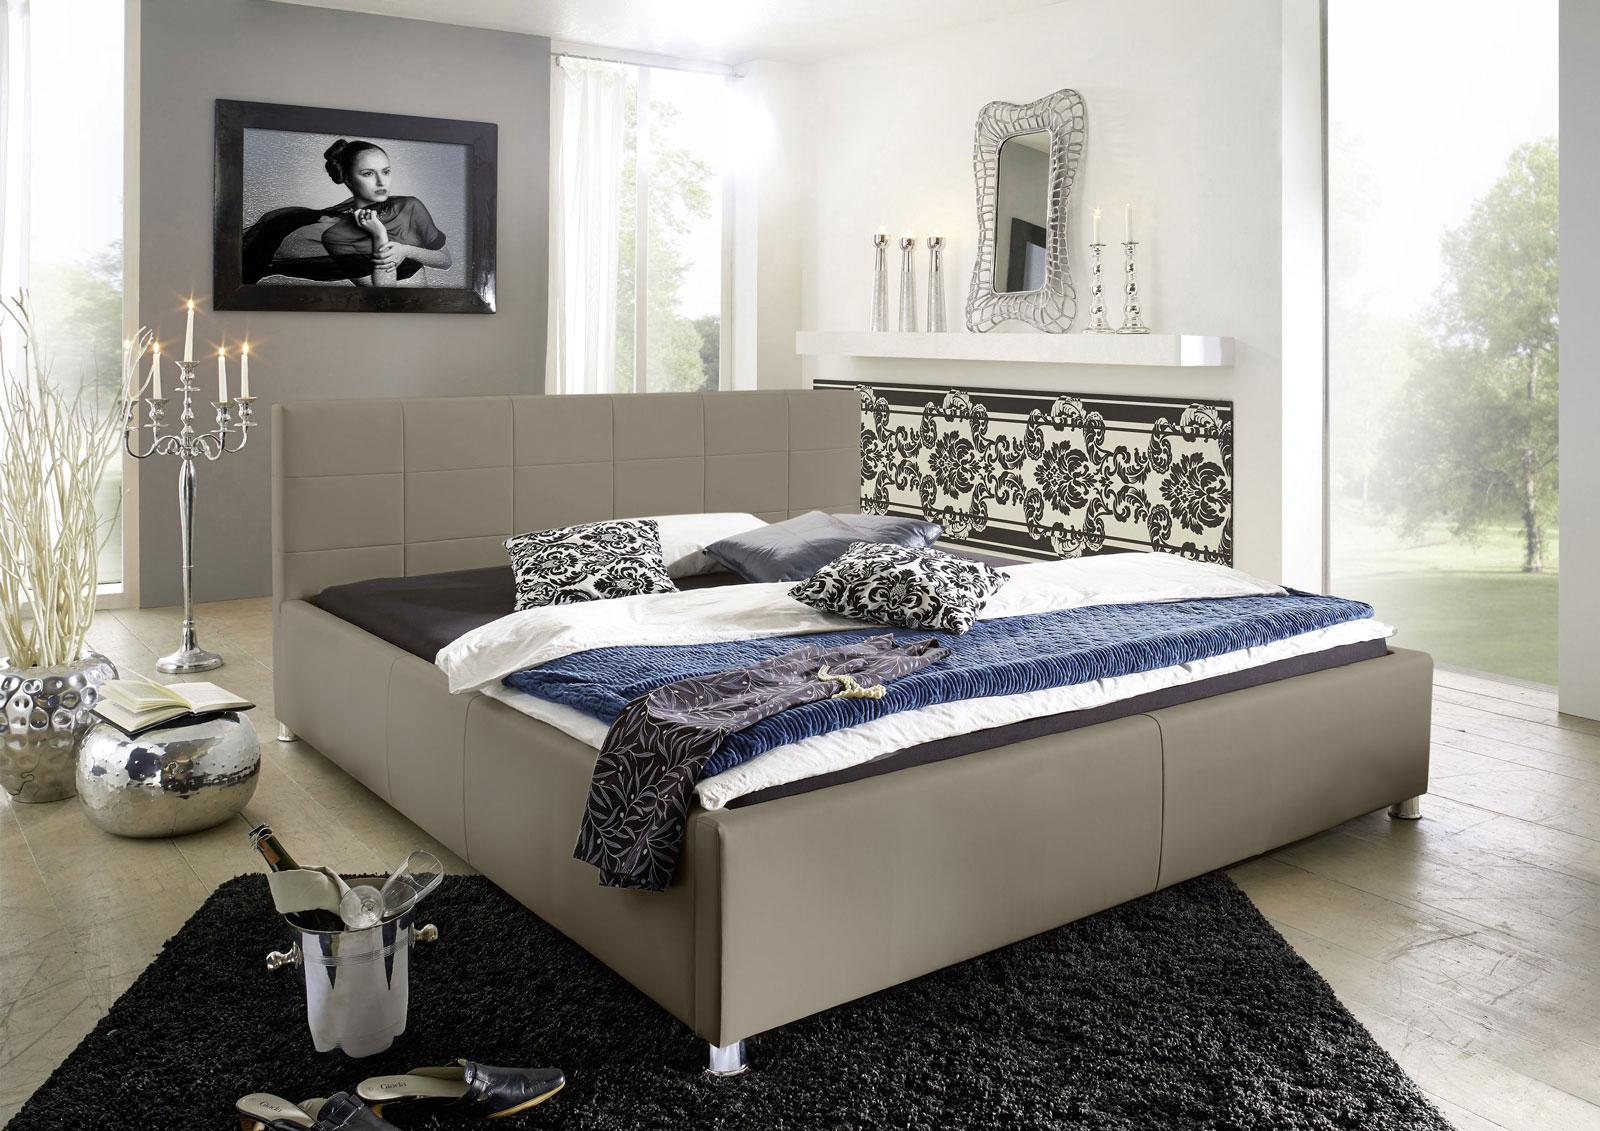 sam polsterbett 140 x 200 cm muddy doppelbett kira. Black Bedroom Furniture Sets. Home Design Ideas